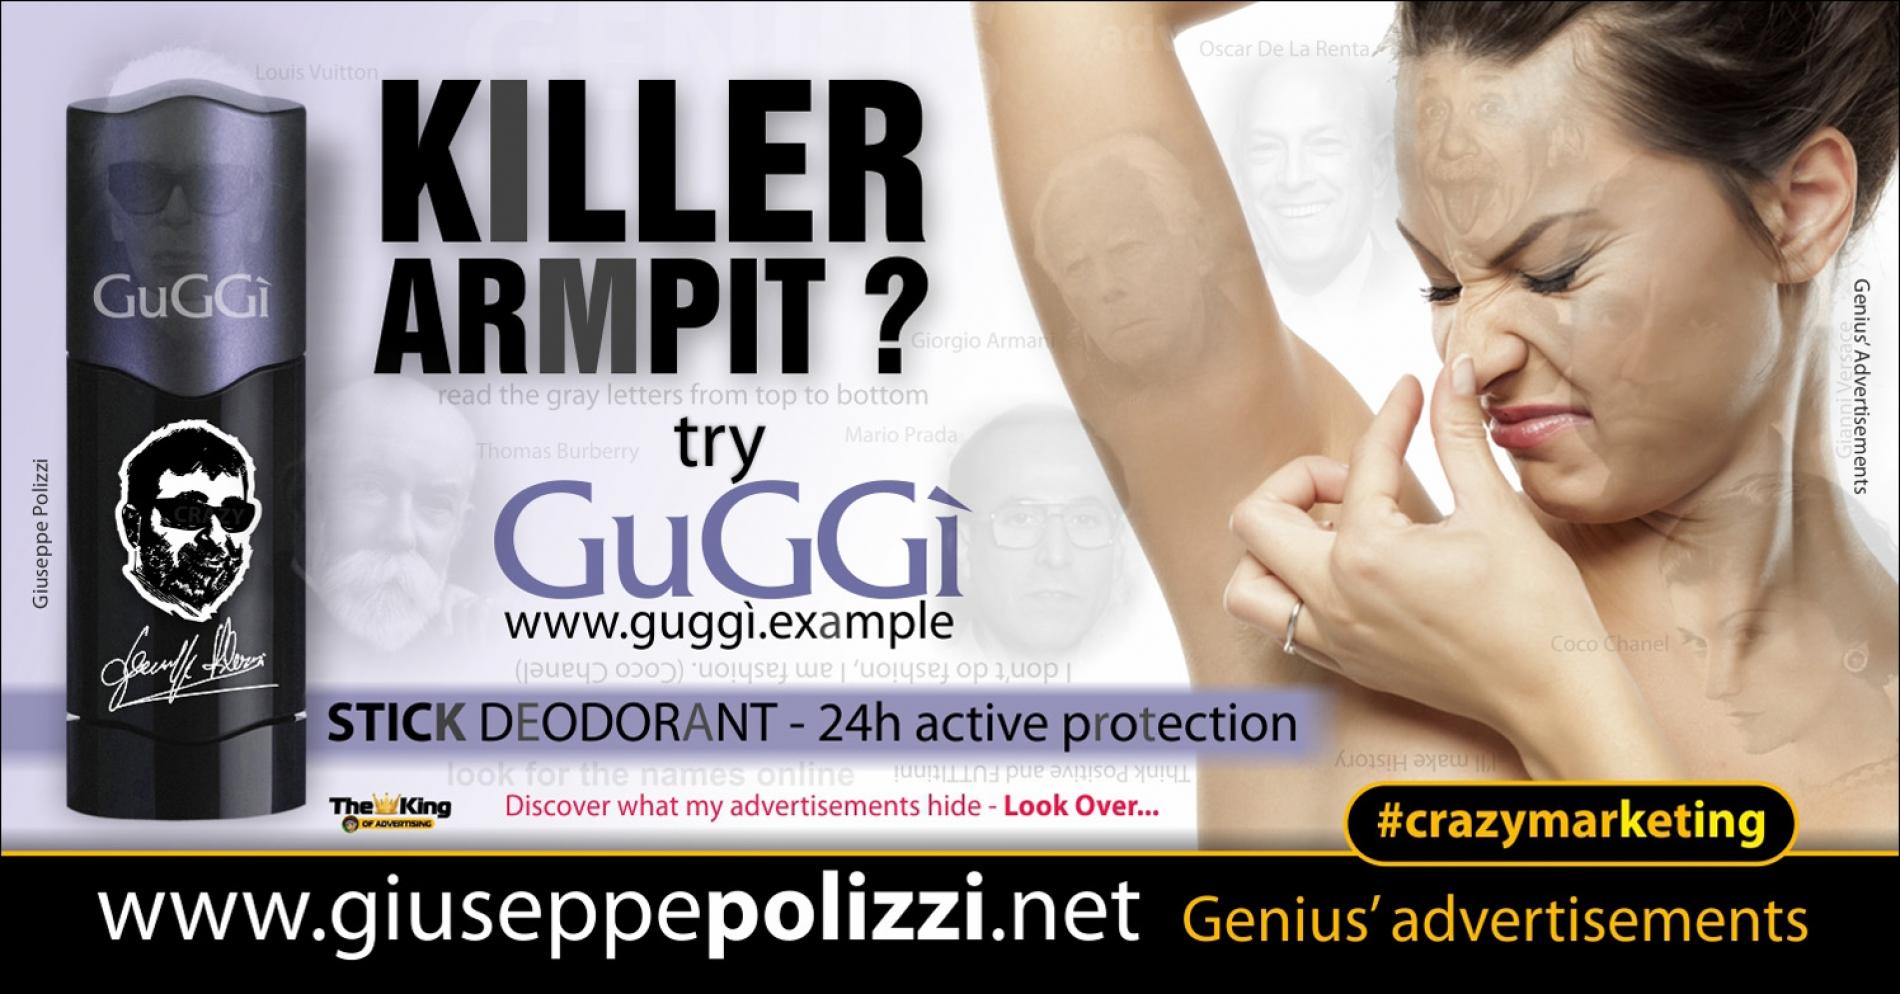 giuseppe Polizzi Killer Armpit crazymarketing pubblicita geniali ENG